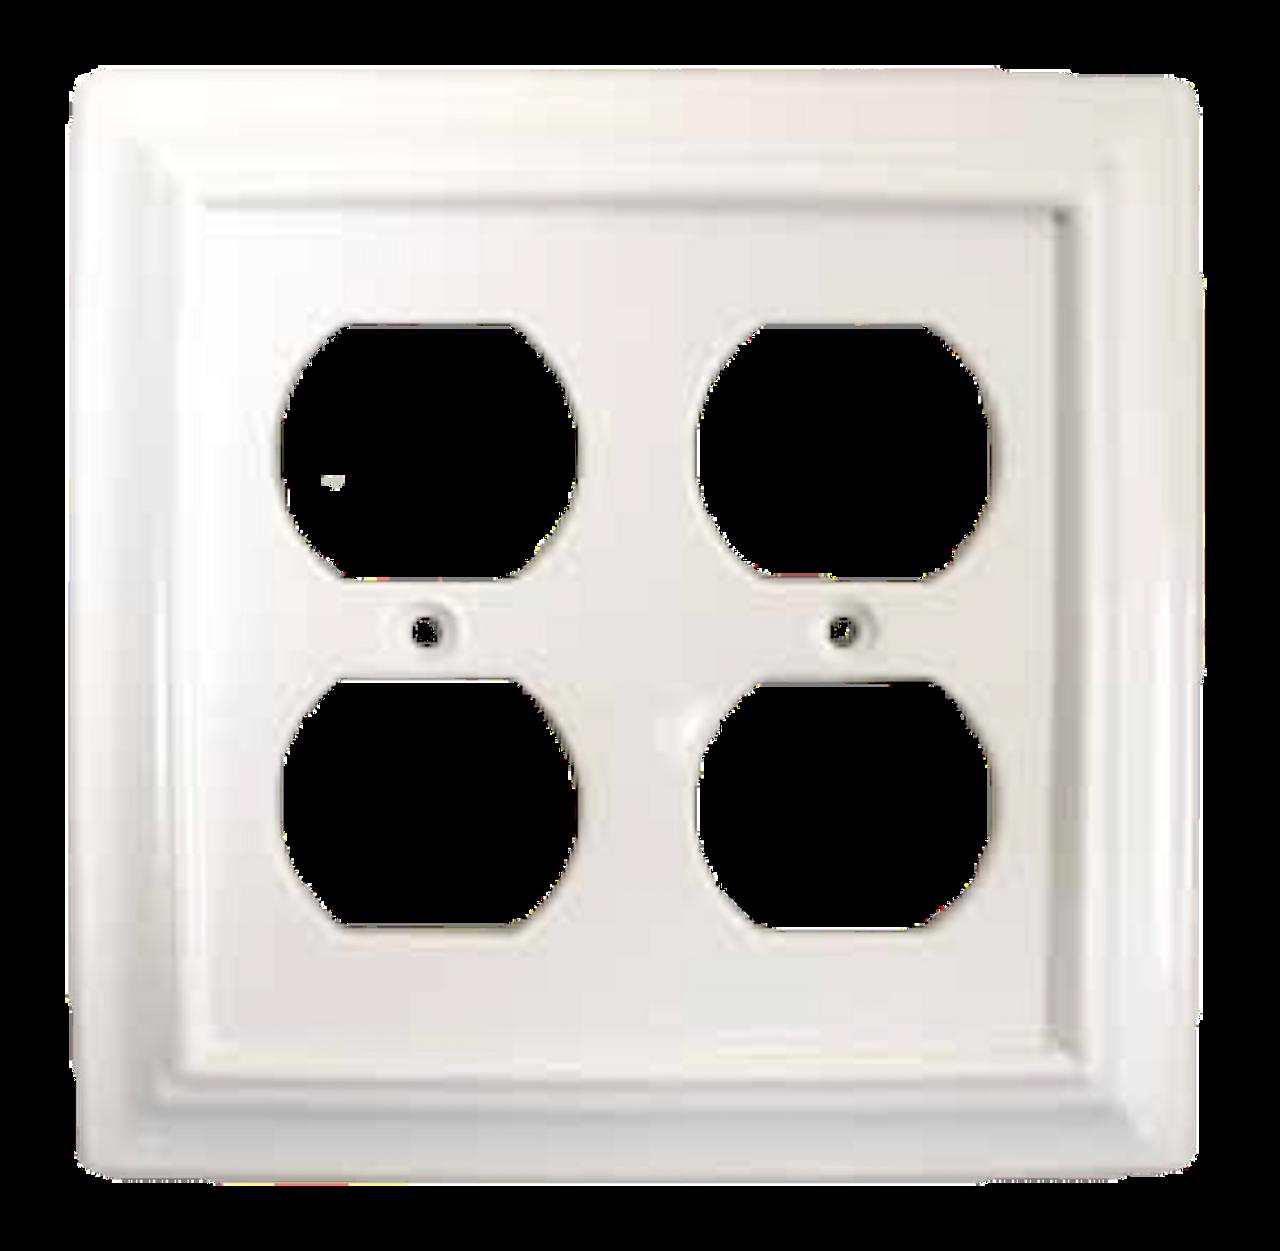 64618 White Architect Double Duplex Cover Plate